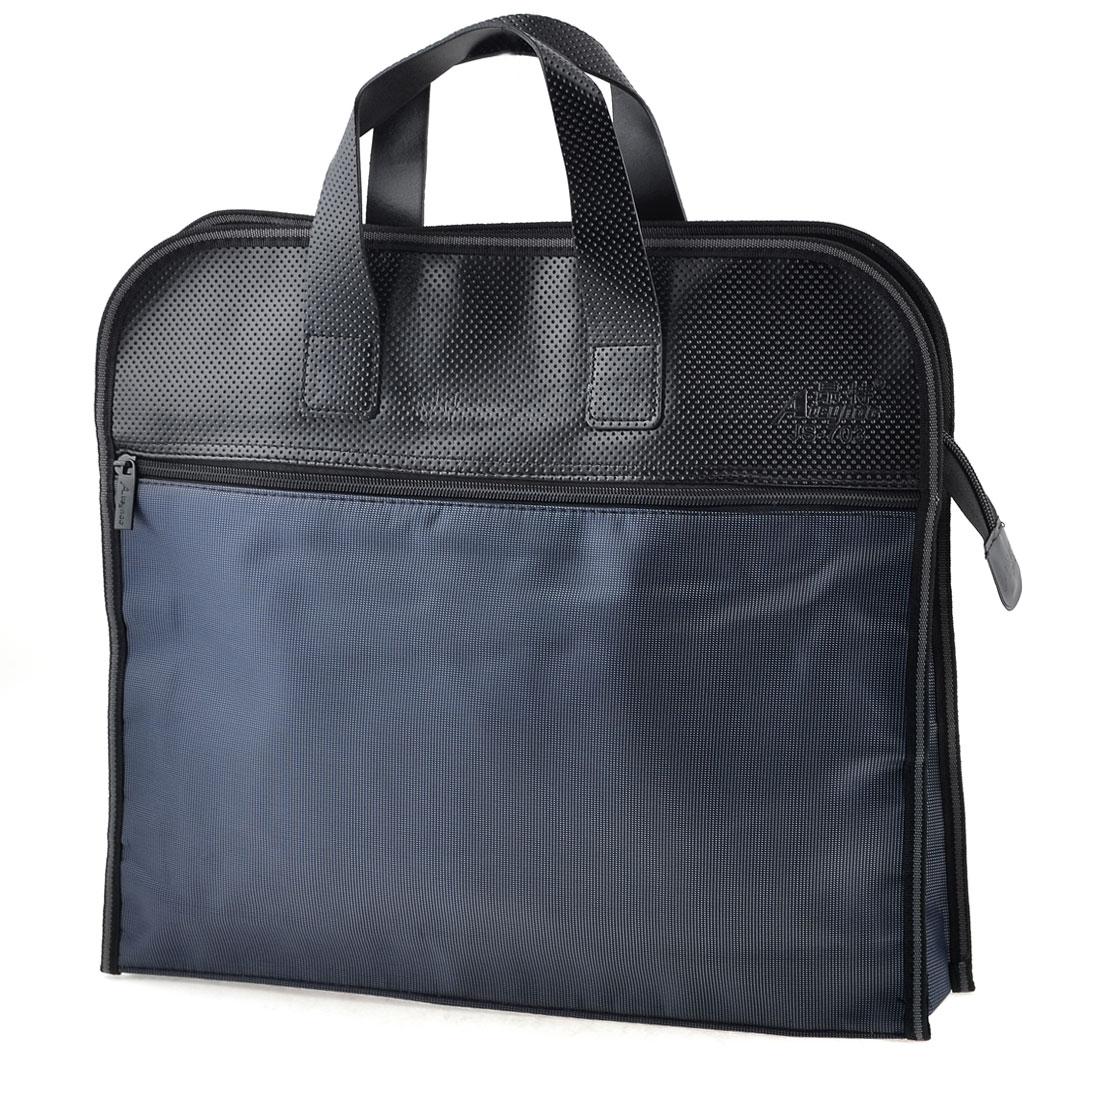 38cm x 33cm Rectangle 2 Sections Zip Up Closure Nylon File Bills Bag Dark Blue